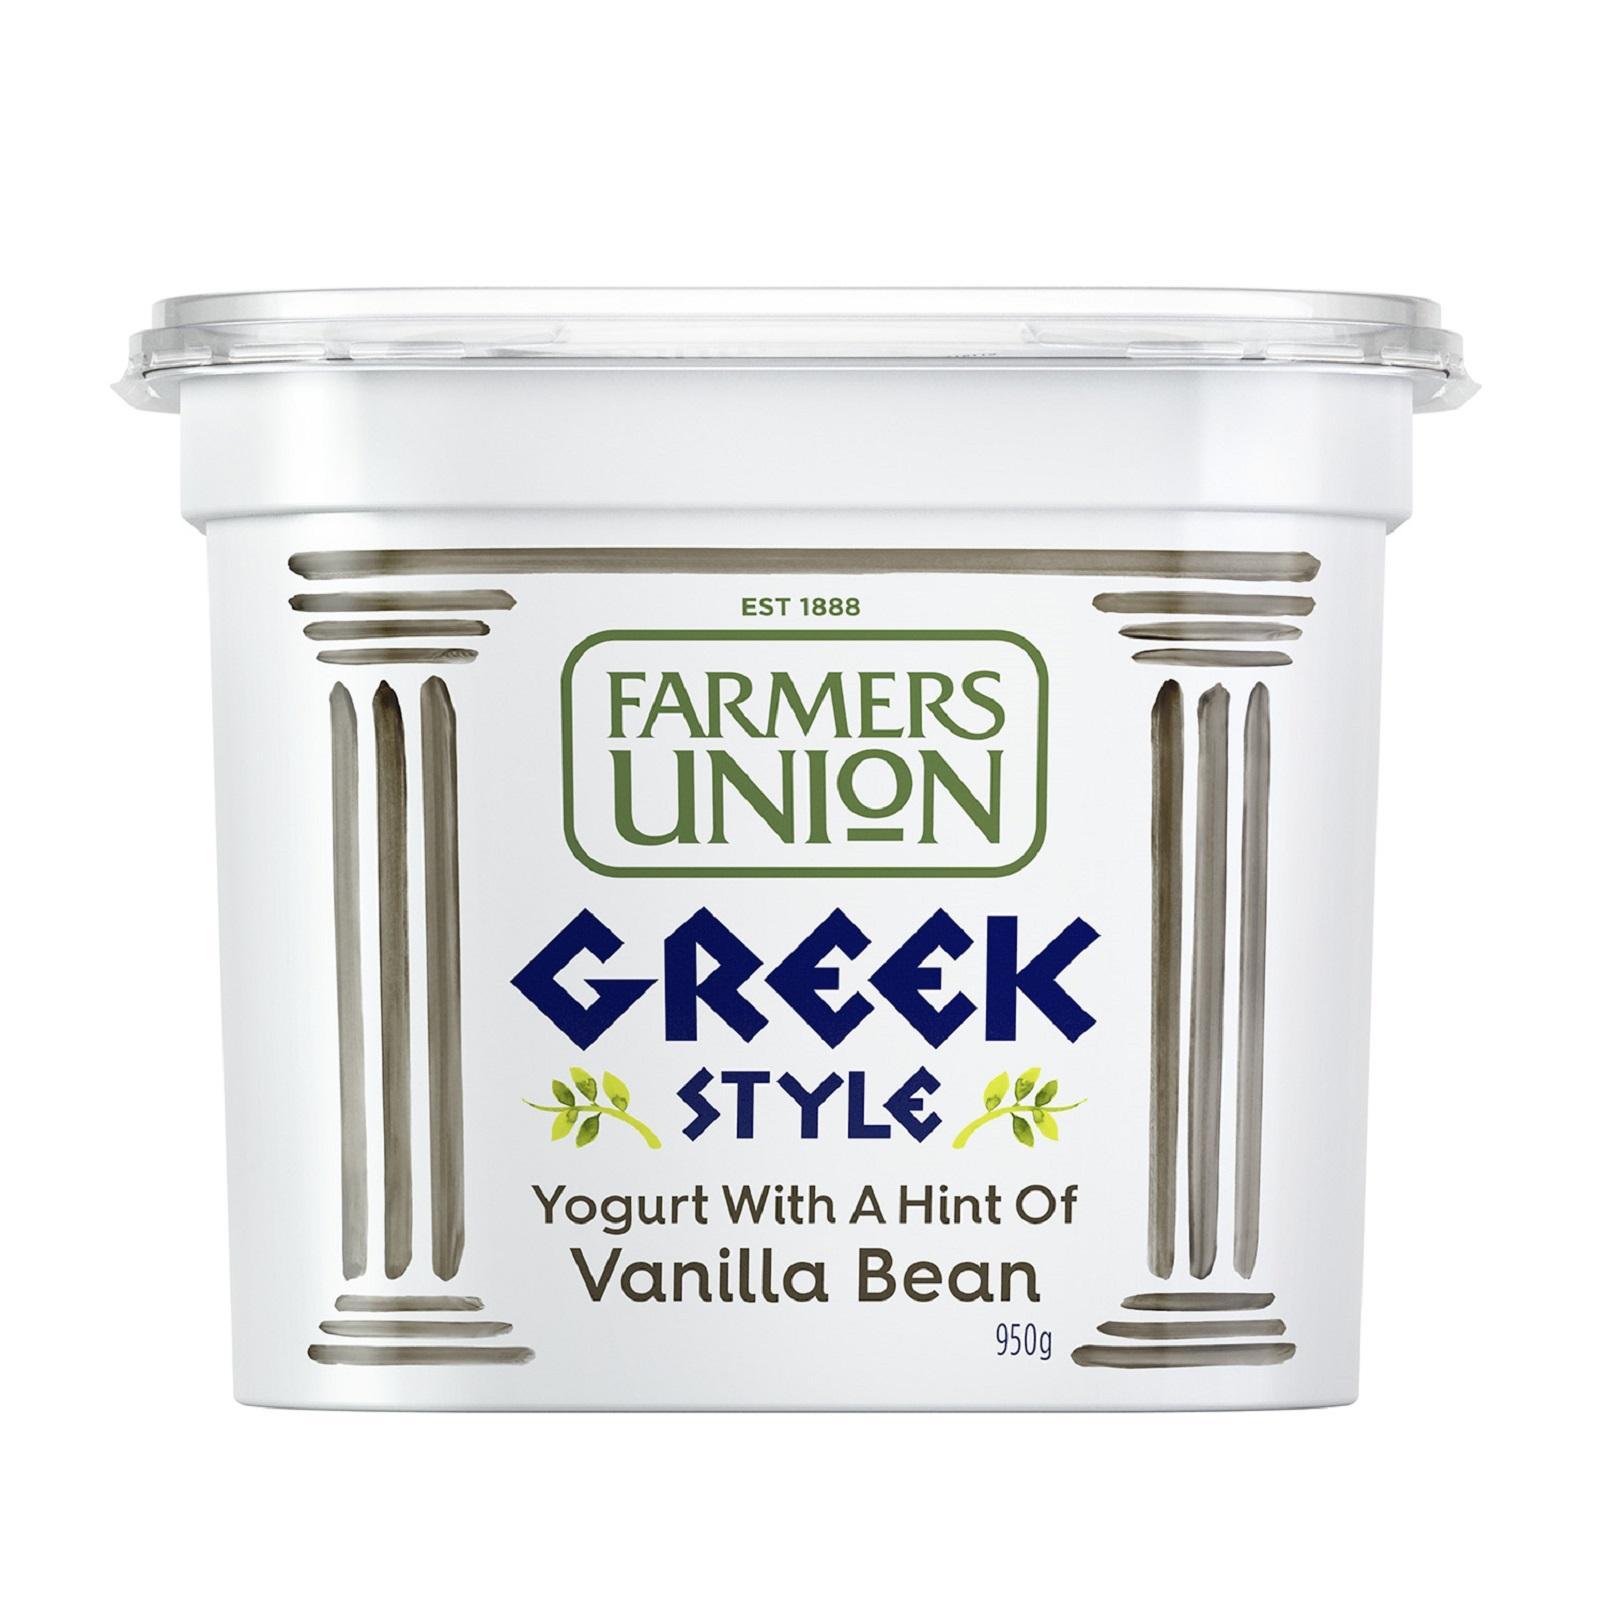 Farmers Union Greek Style With Vanilla Bean Yoghurt